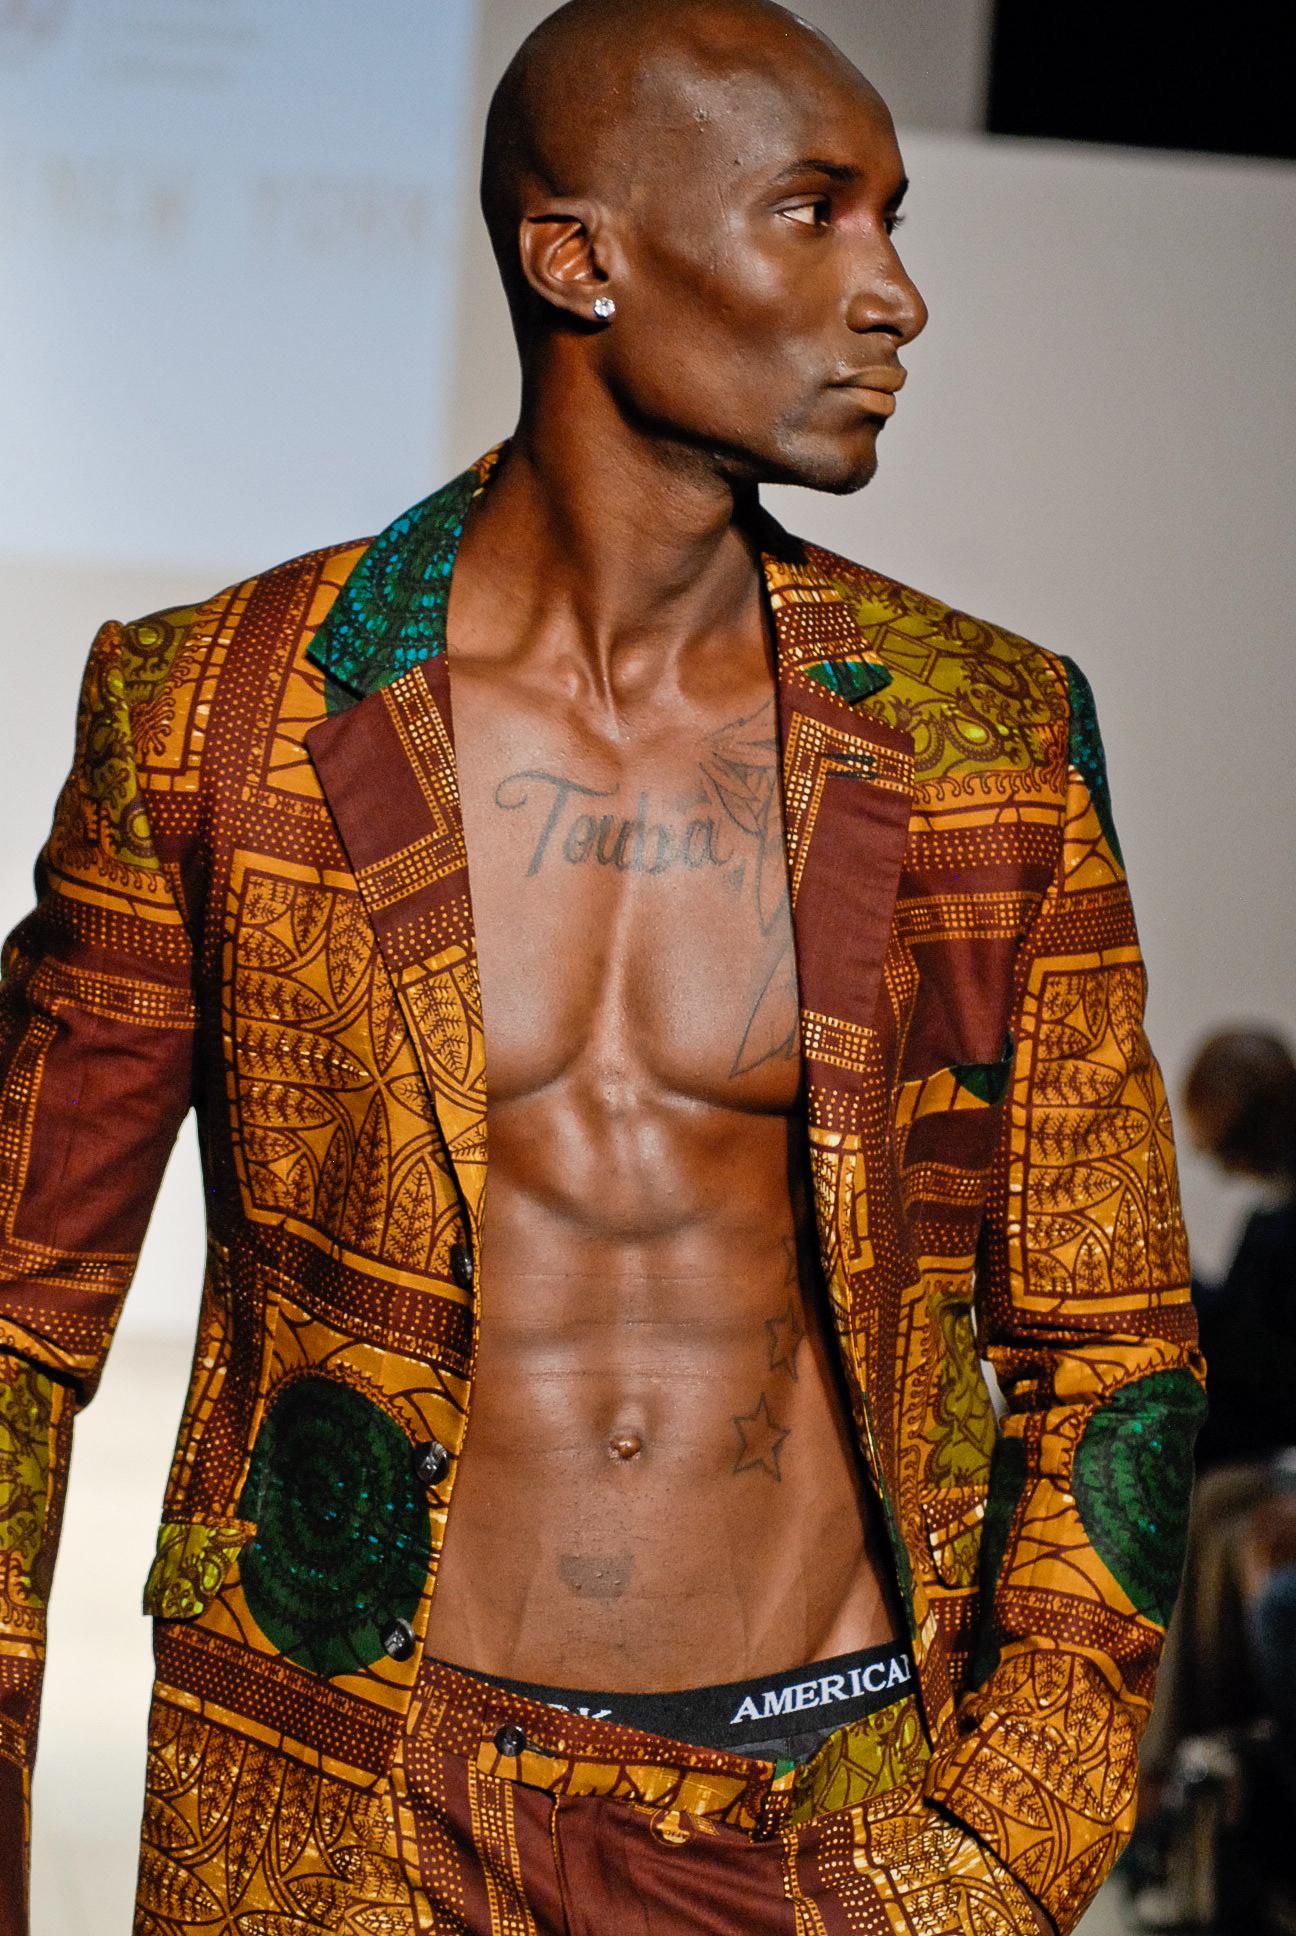 Kibonen-at-Africa-Fashion-Week-in-New-York-AFWNY-2012-4 (2)